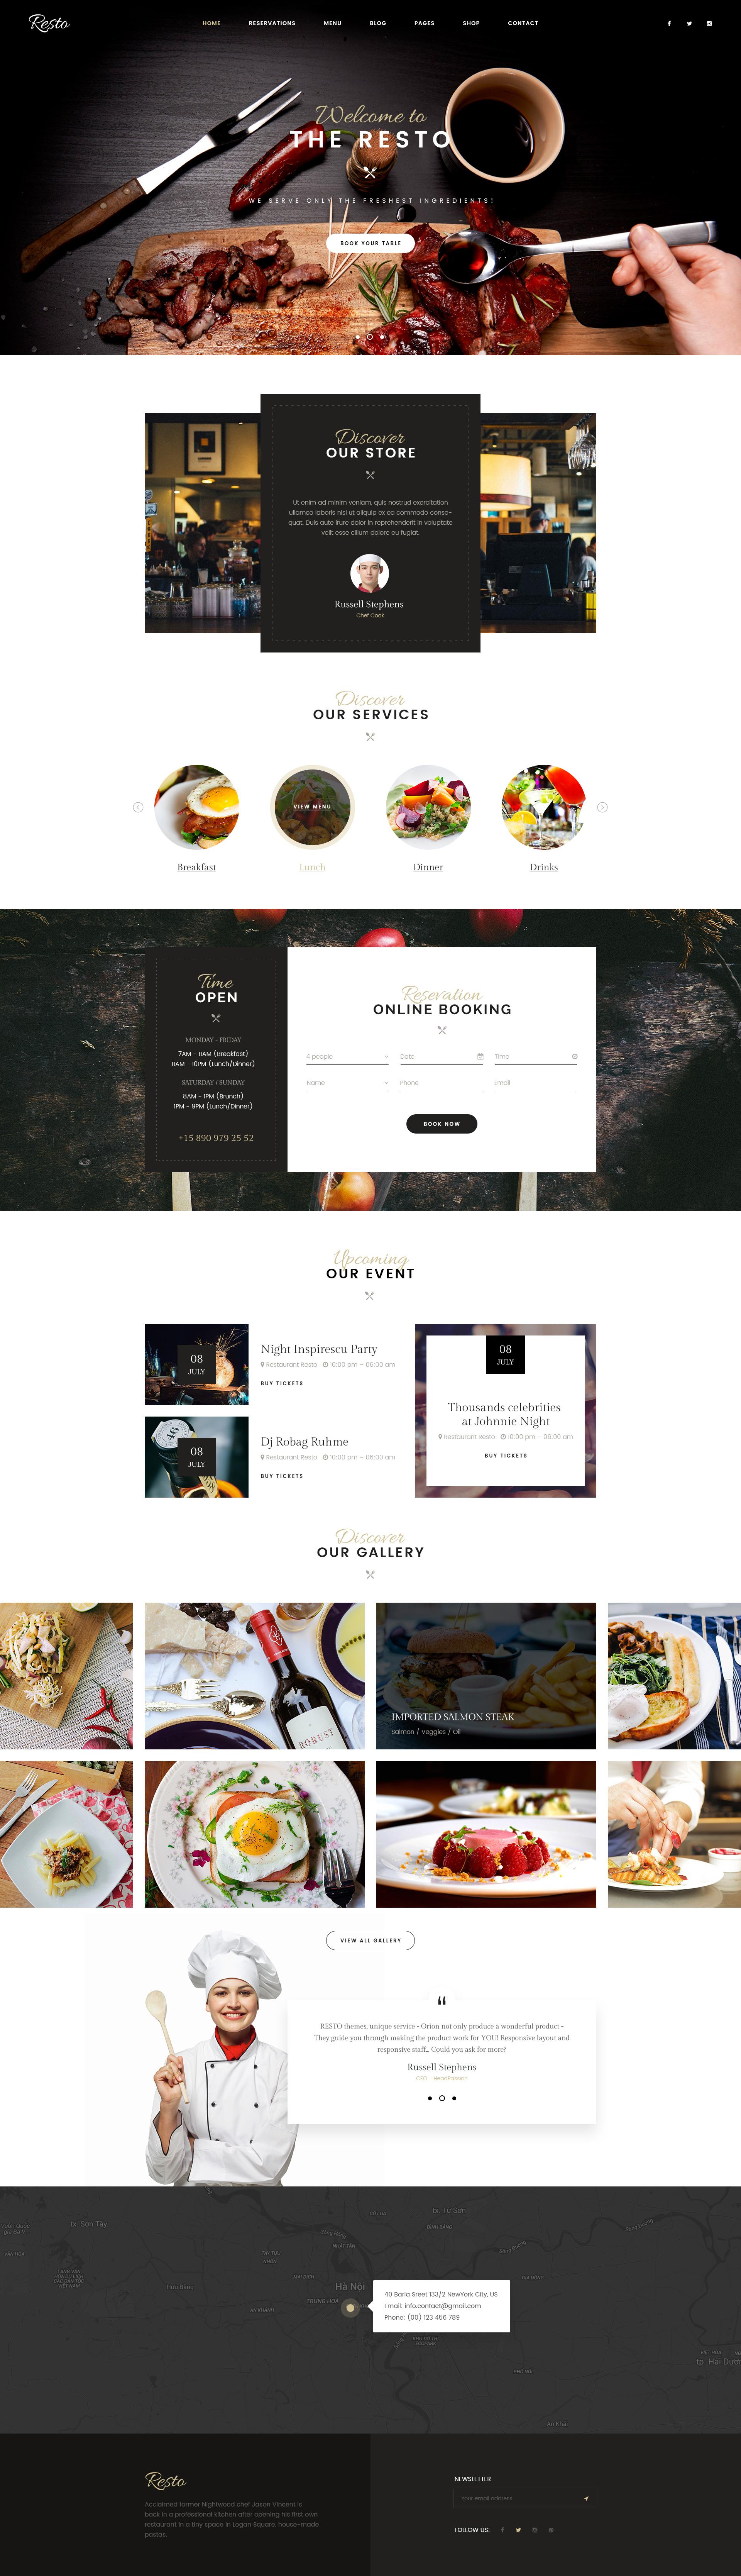 Resto | Multipurpose Restaurant & Cafe PSD Template by Leonard_Design